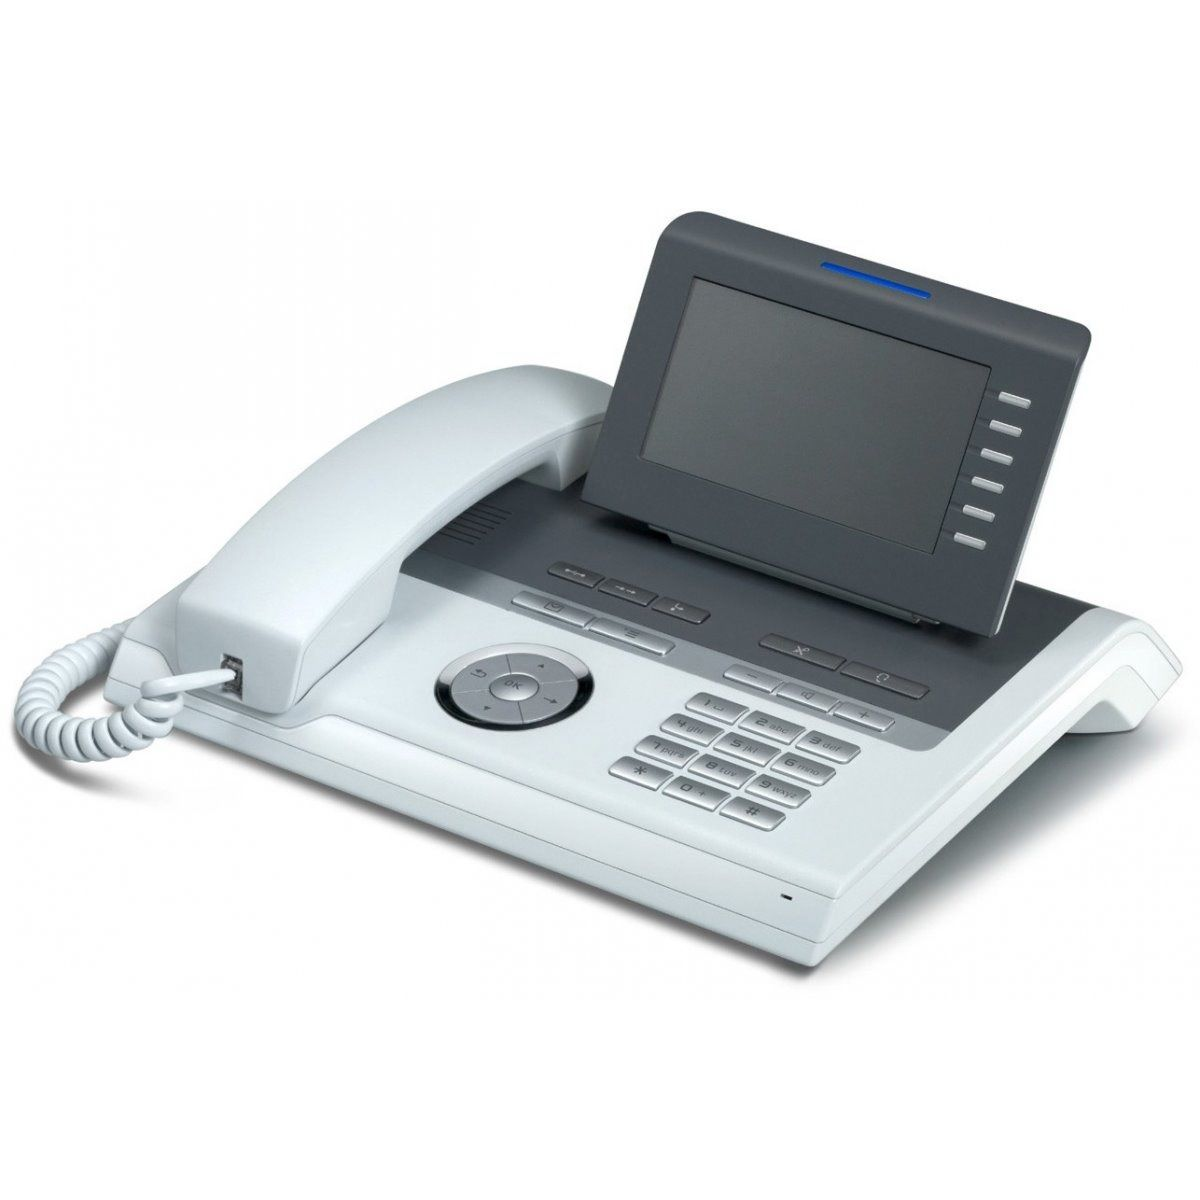 Telefone IP OpenStage 40 TDM - Siemens